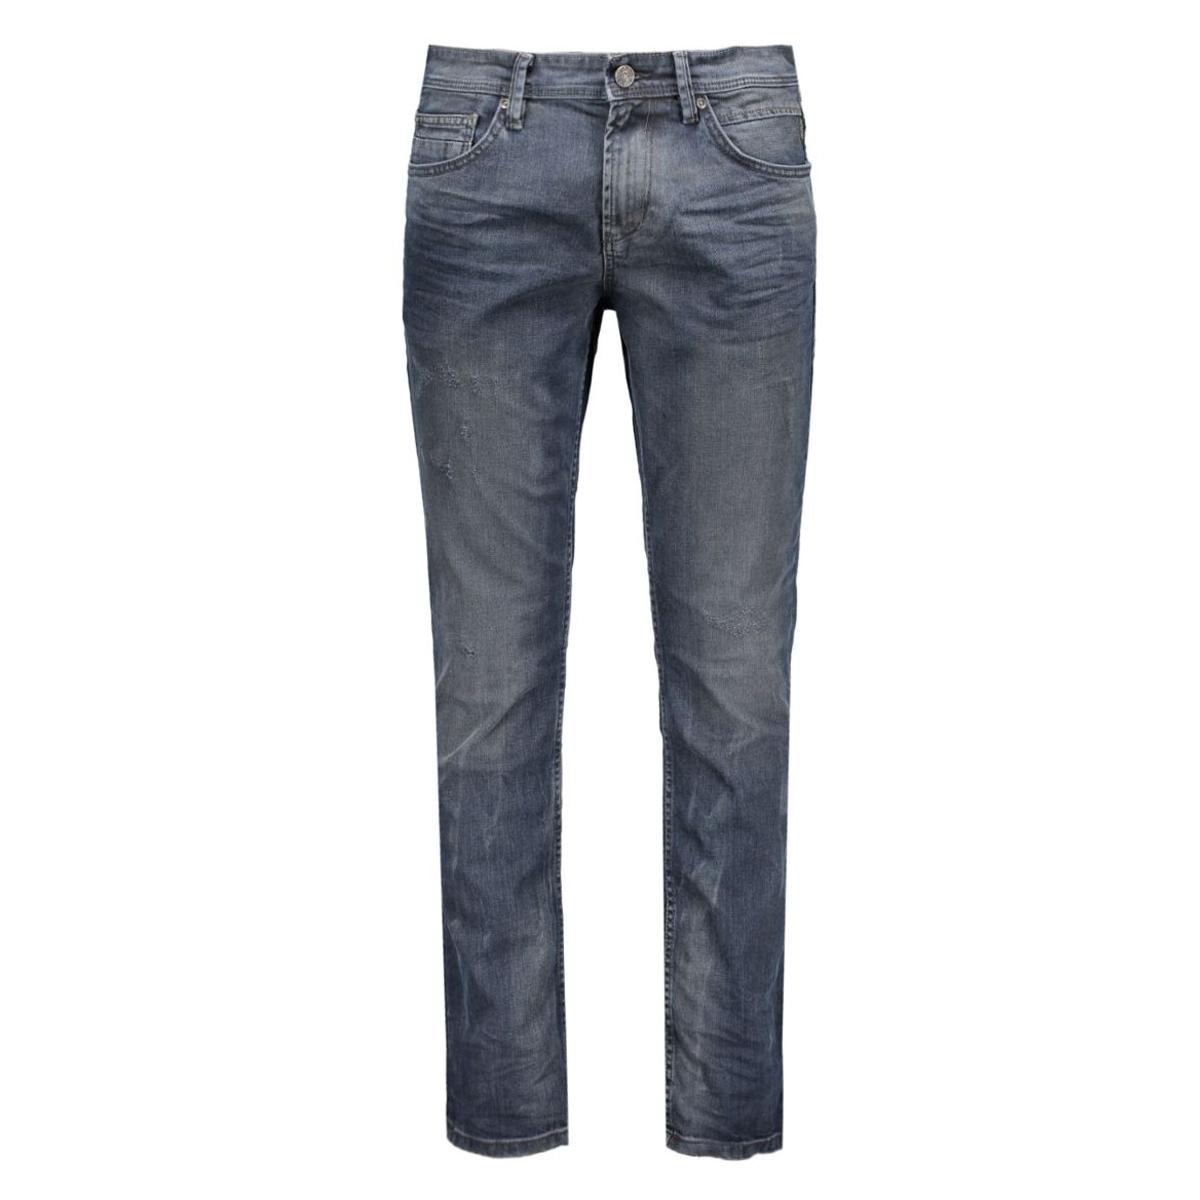 6204726.09.12 tom tailor jeans 1088